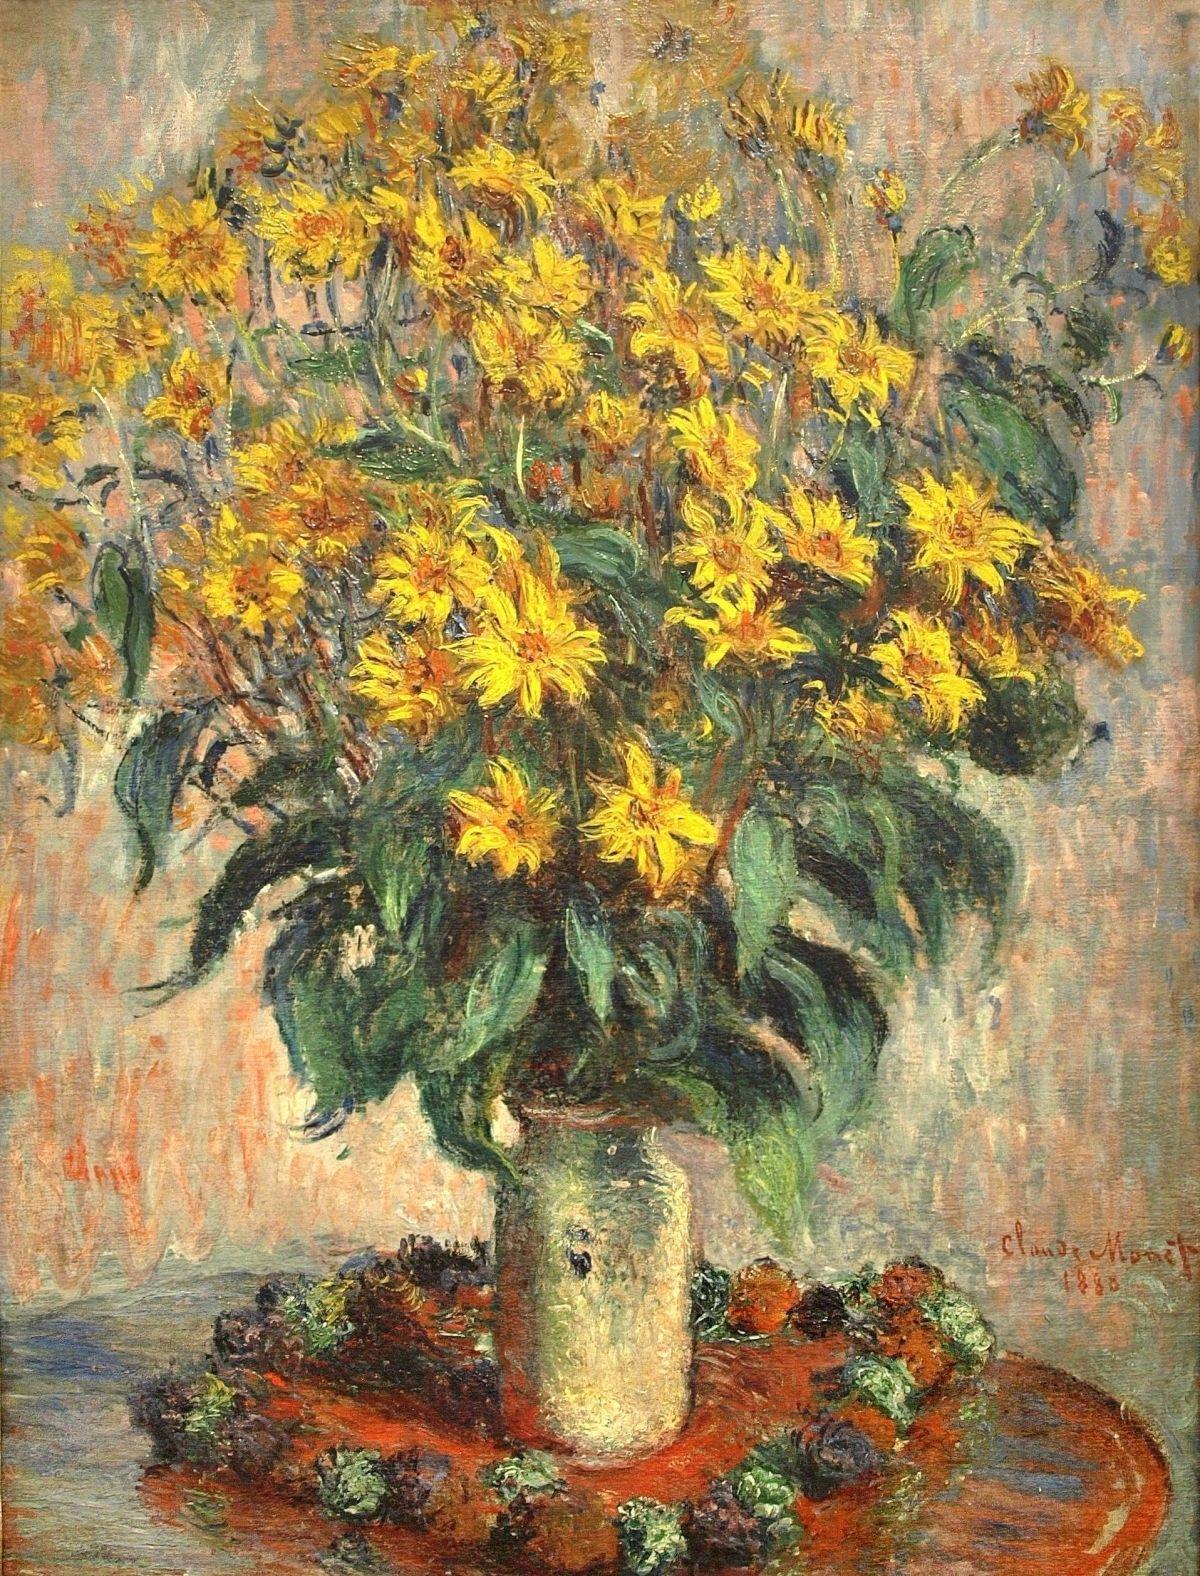 jerusalem artichokes, 1880 in 2020 | Art inspiration painting, Art,  Colorful art